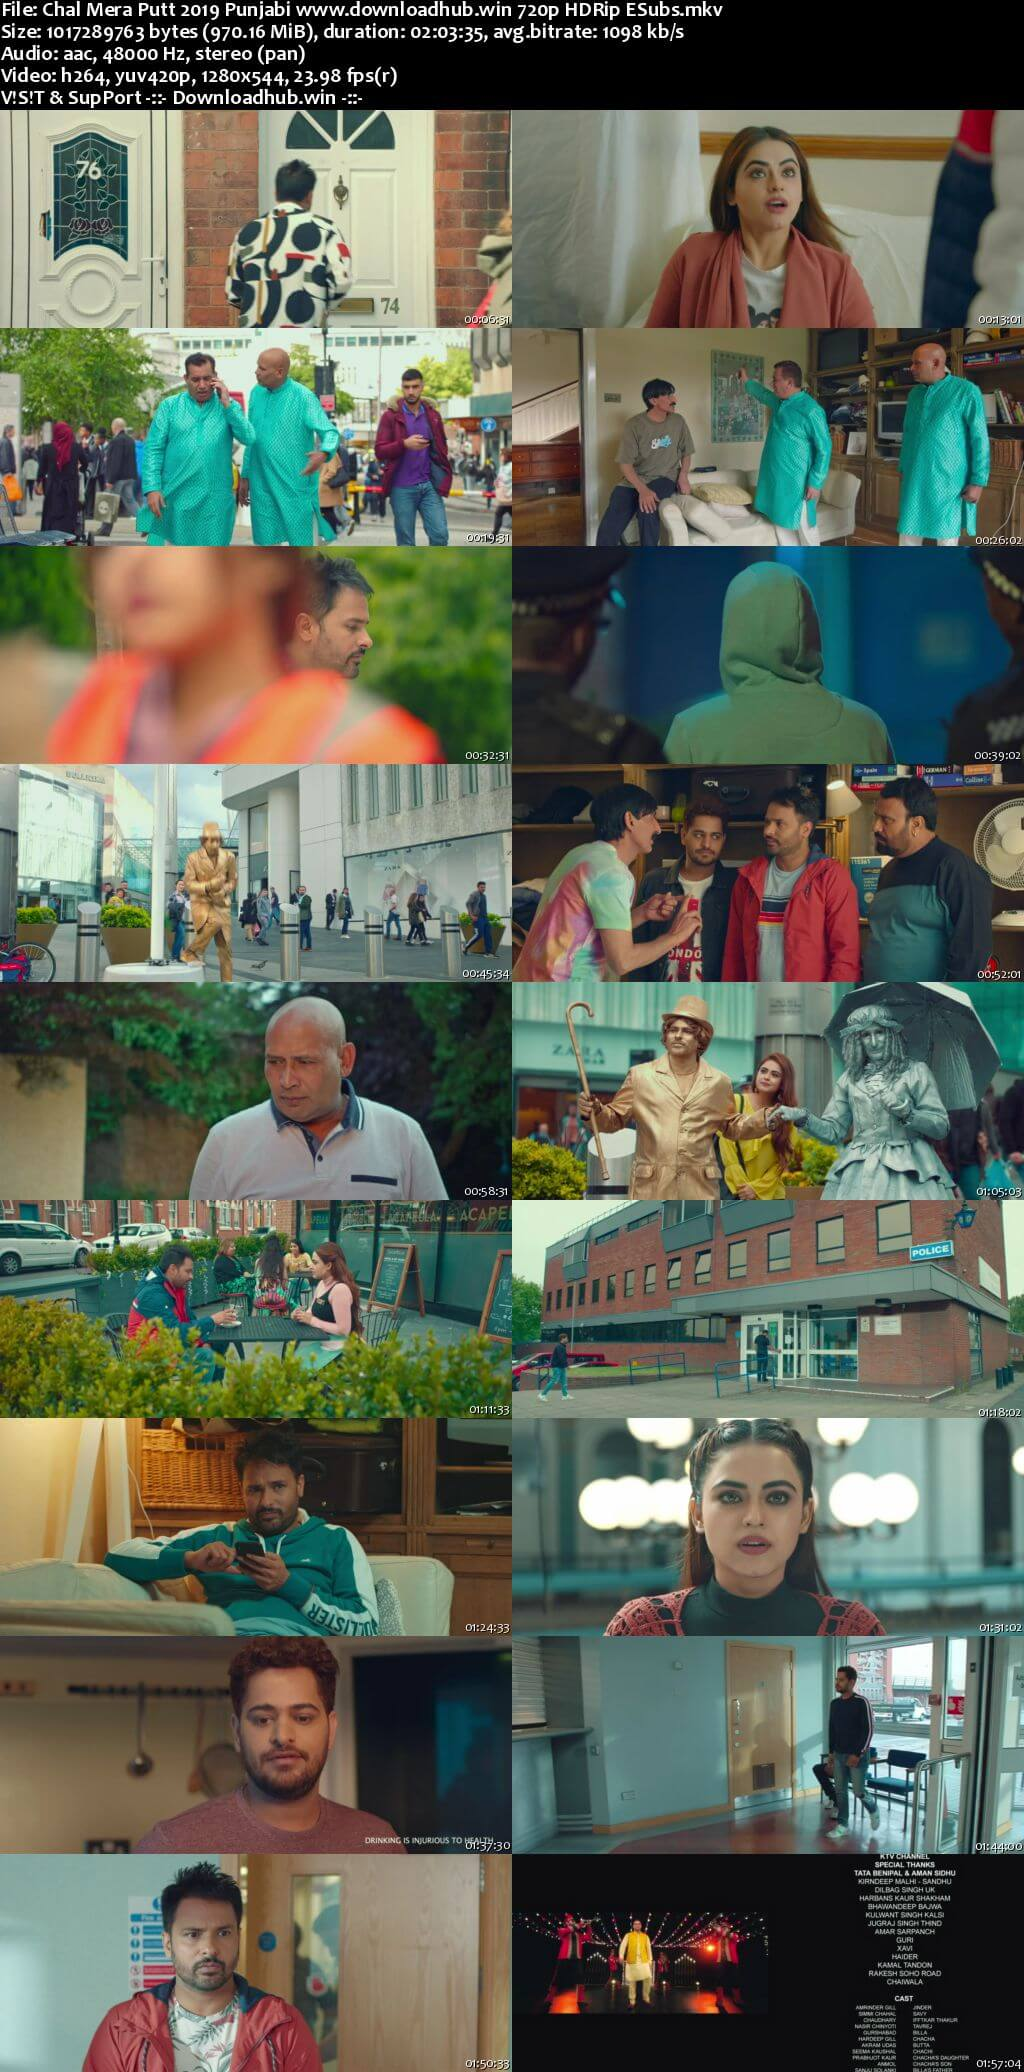 Chal Mera Putt 2019 Punjabi 720p HDRip ESubs